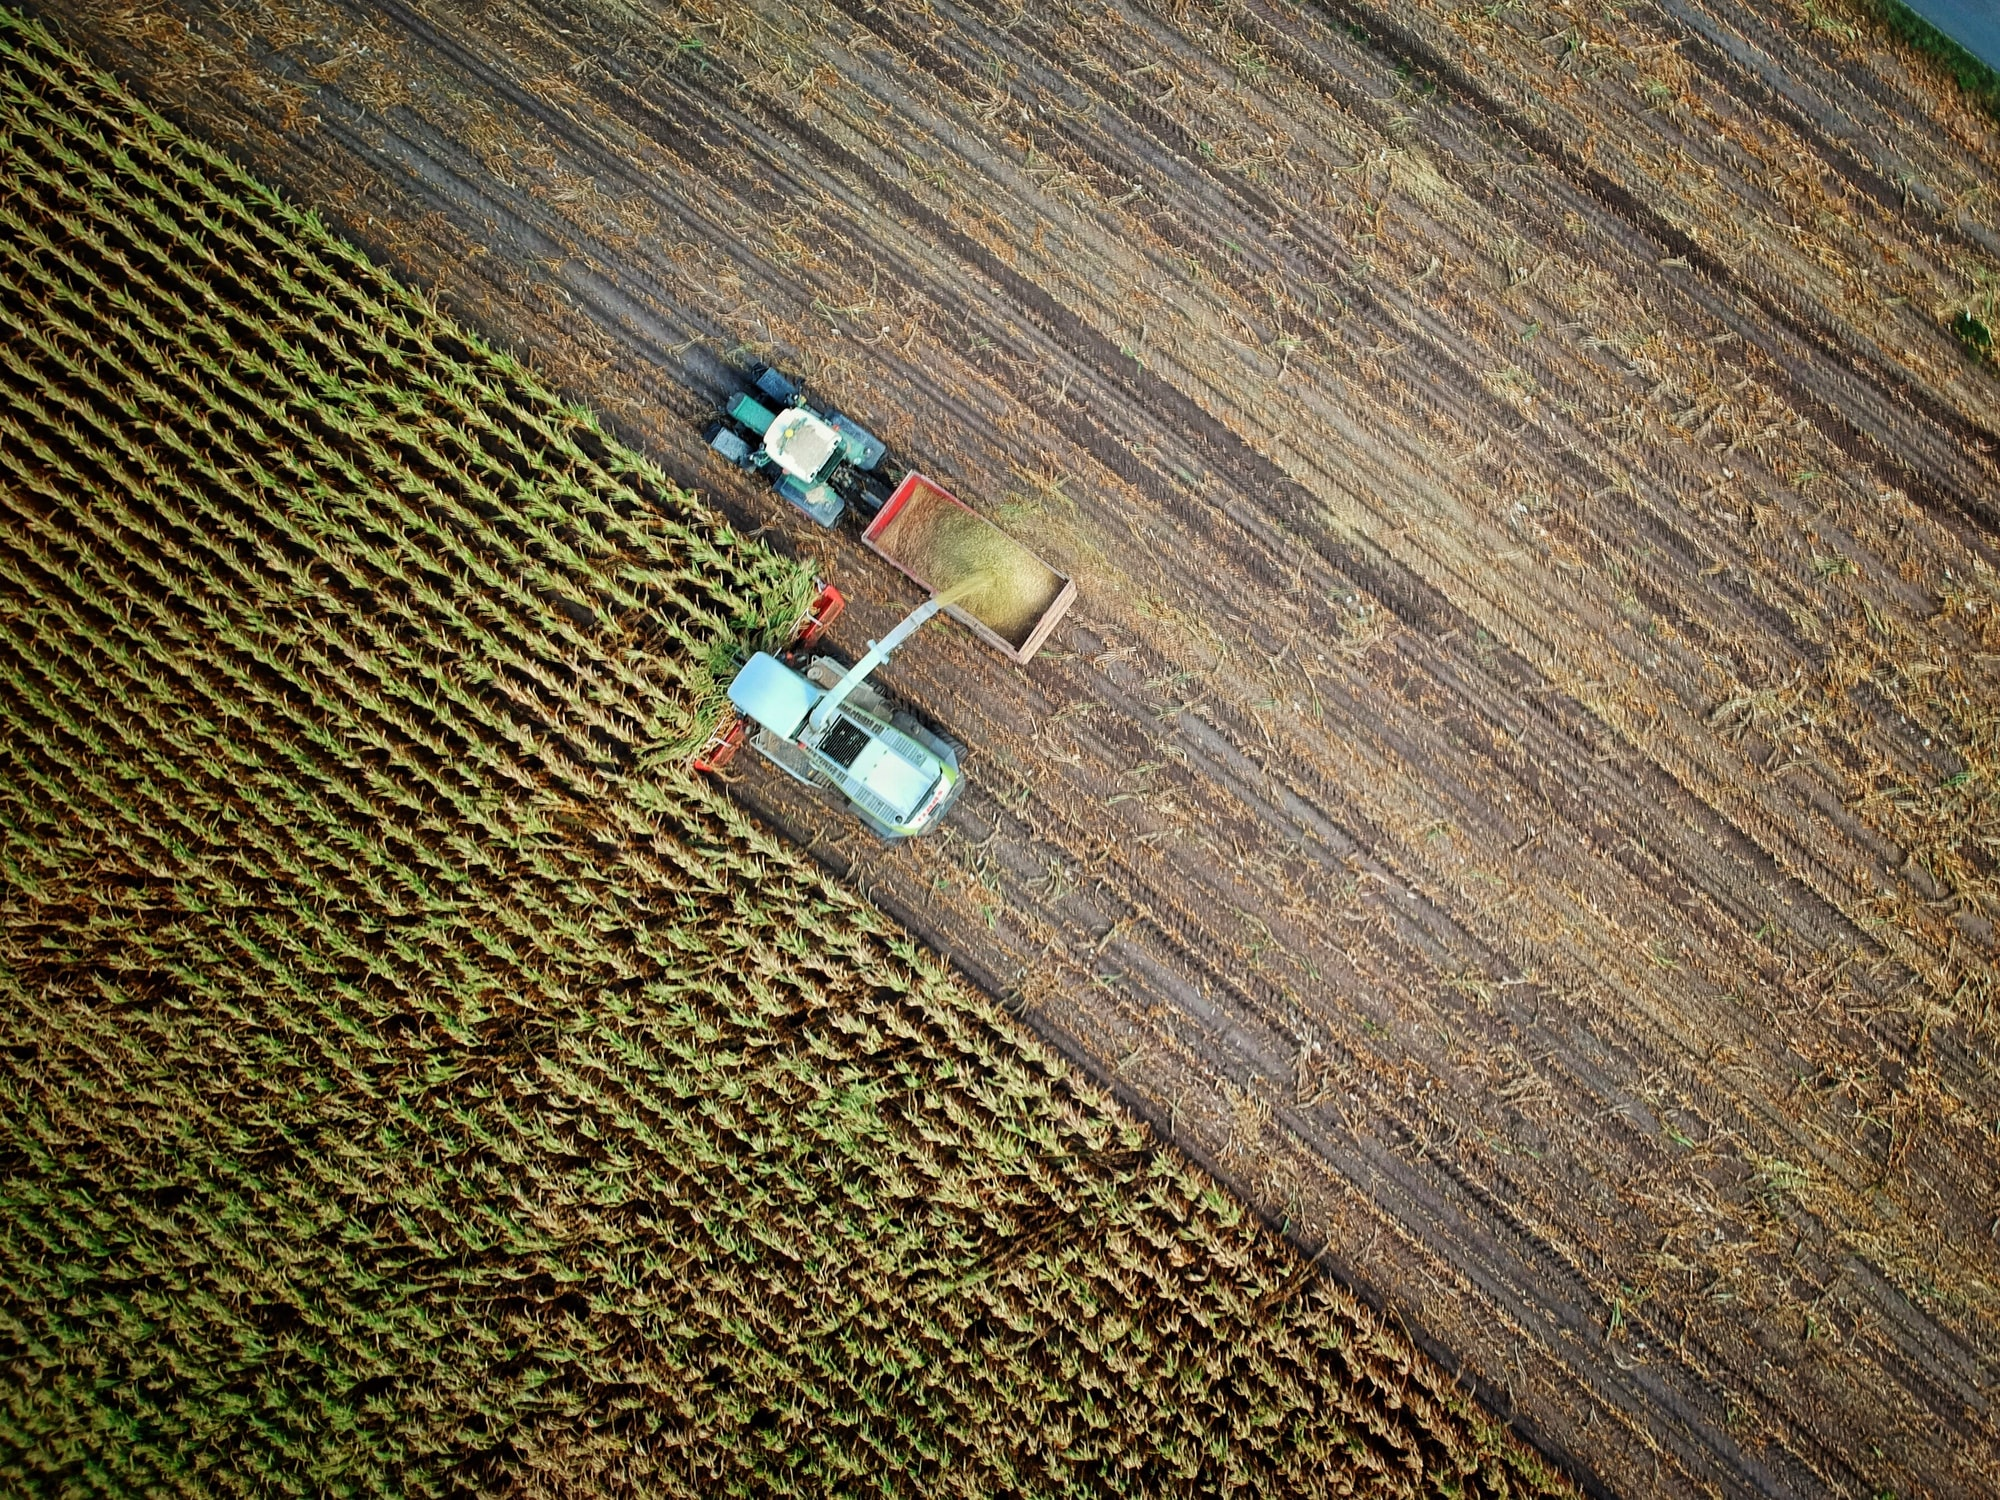 Role of IoT Technology in Enabling Smart Farming